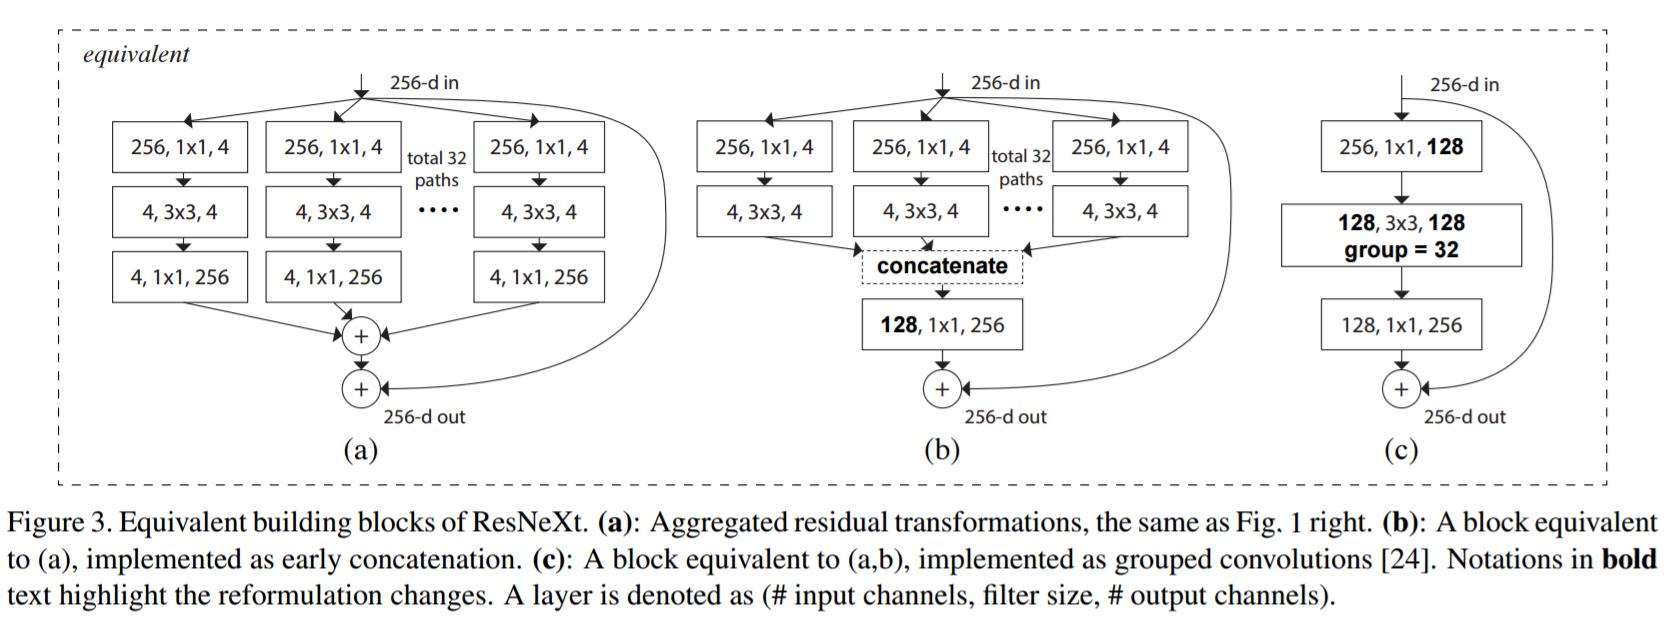 equivalent blocks